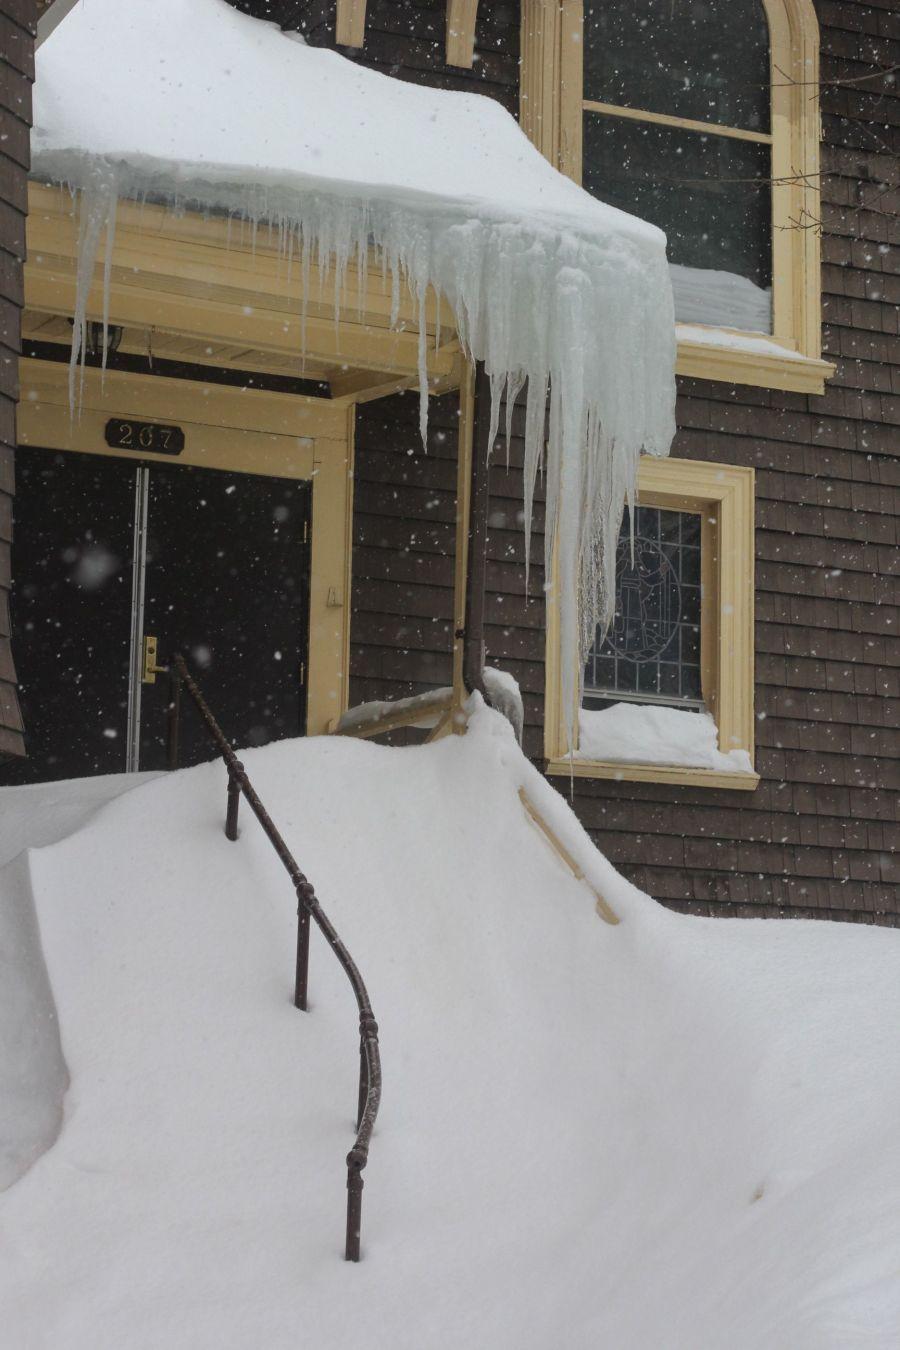 boston jamaica plain winter february 17 2015 icicles church 2